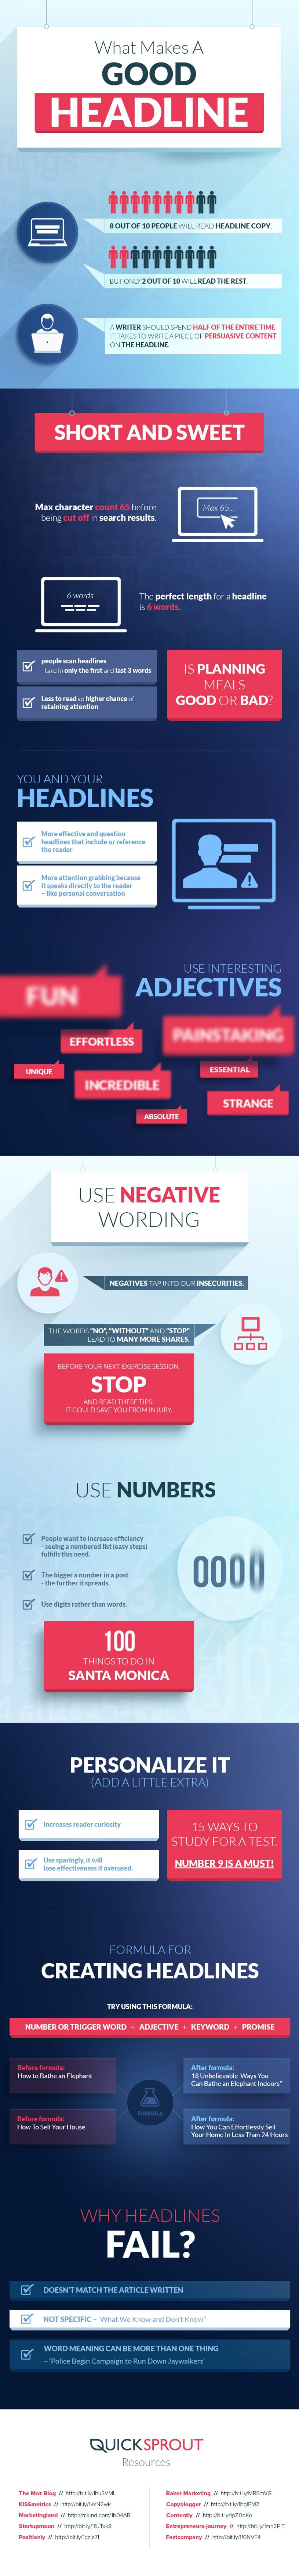 Infografik zum Thema gute Headlines